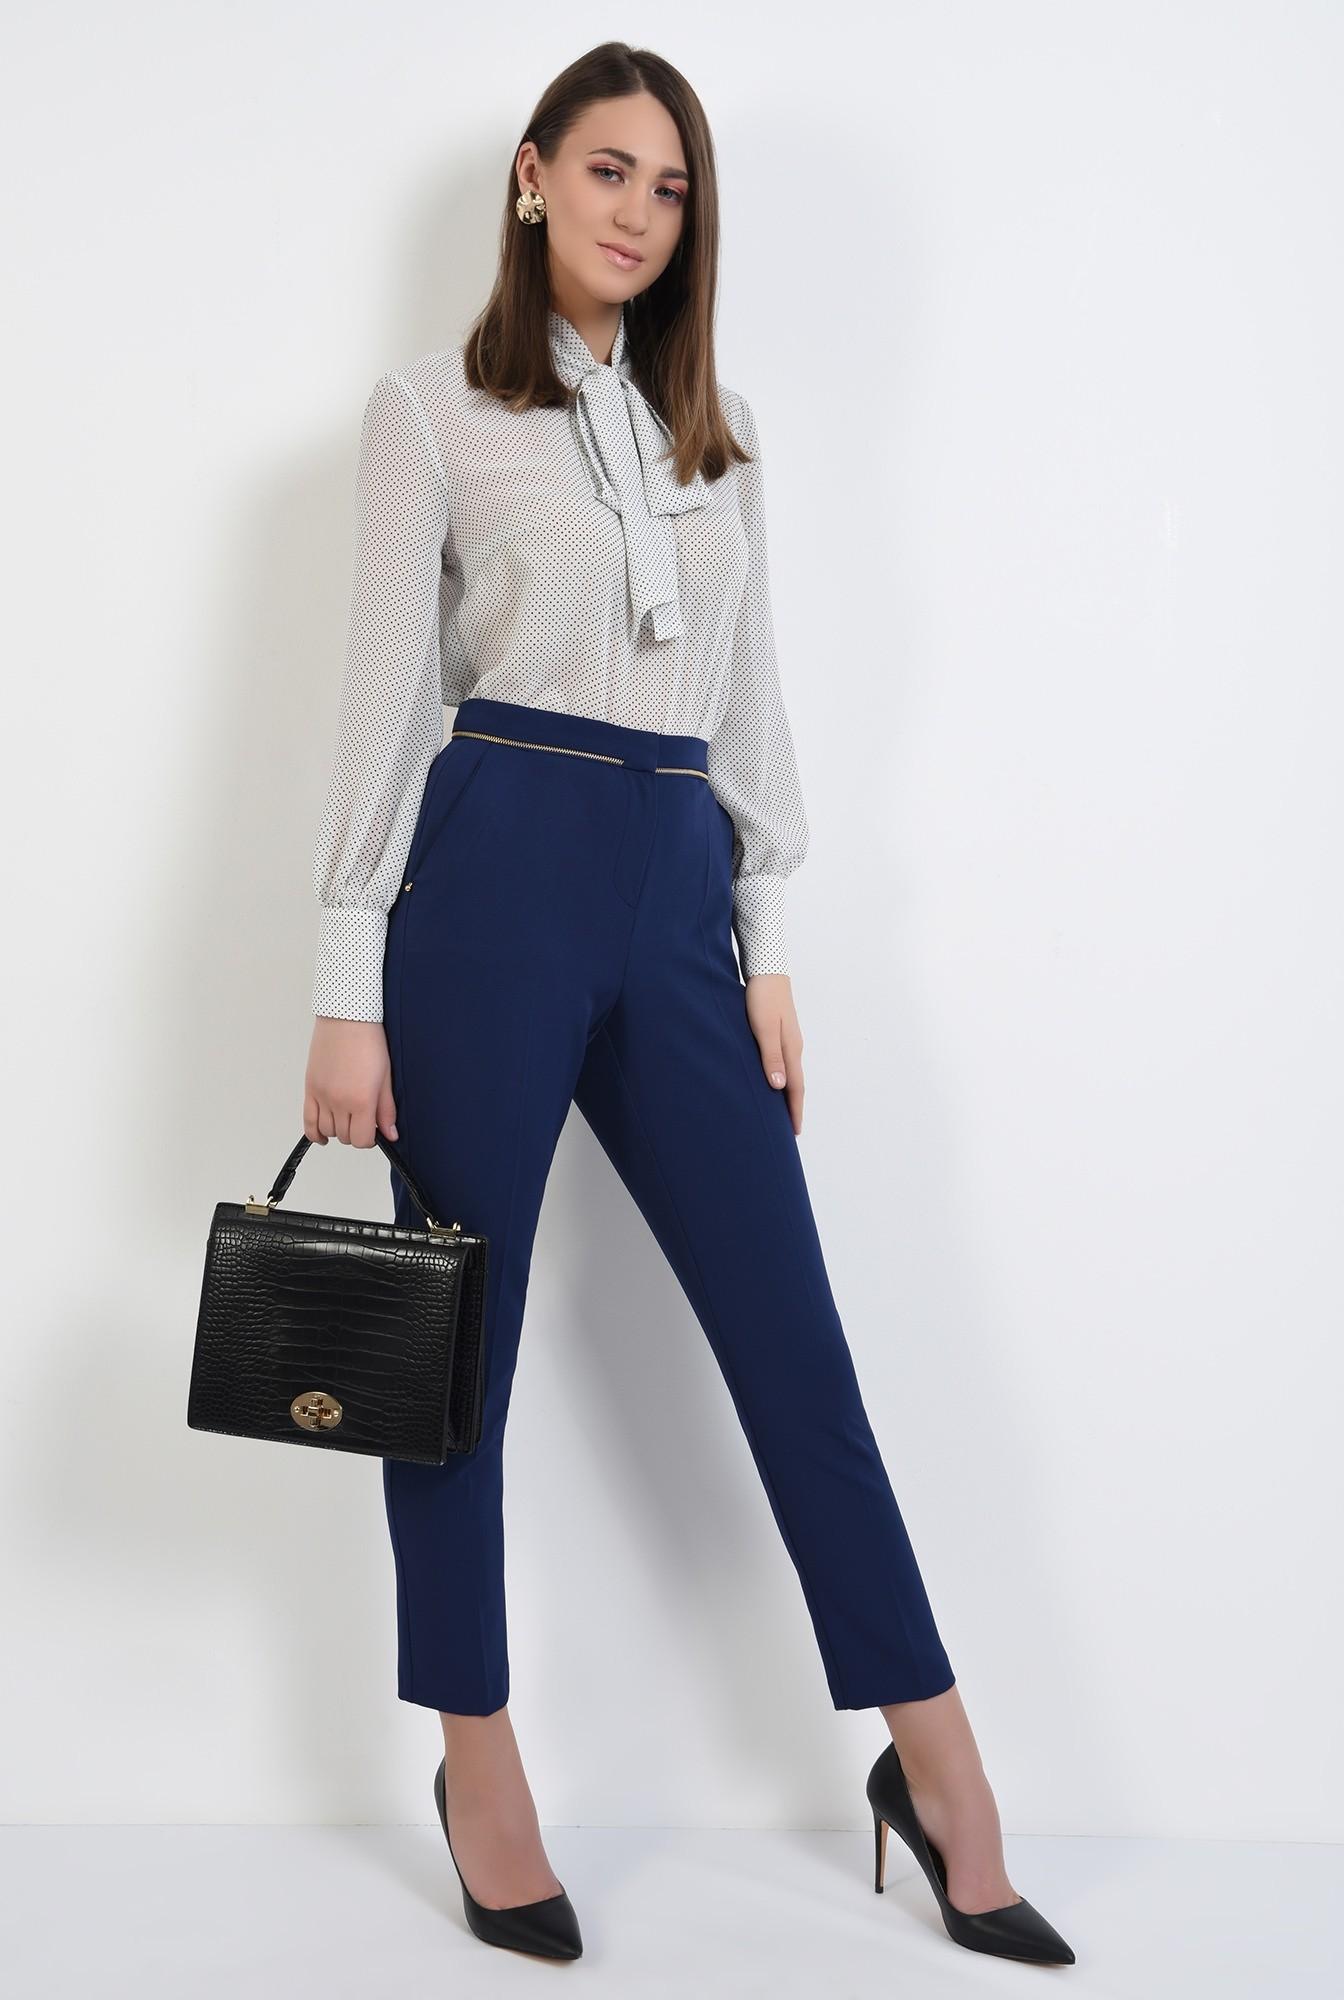 360 - pantaloni office, bleumarin, talie medie, cu buzunare, pantaloni de primavara